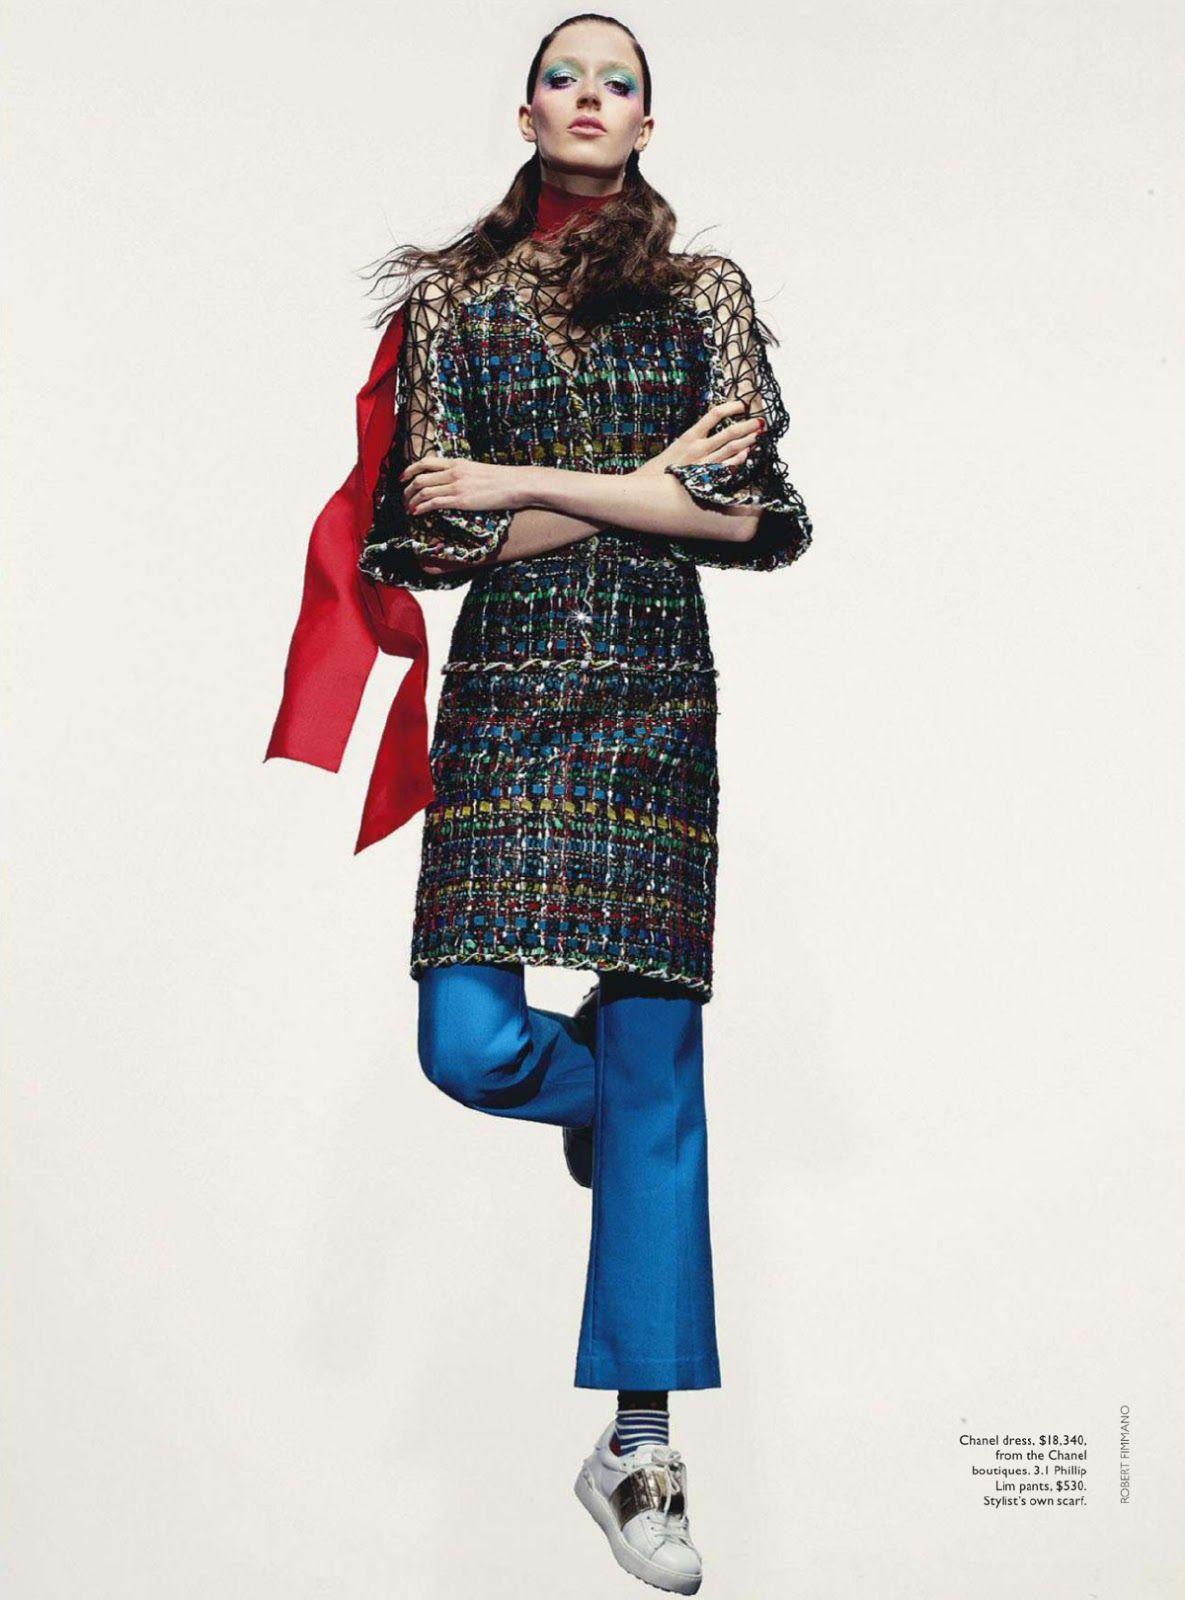 Vogue Austrália Janeiro 2015 | Josephine Van Delden por Robbie Fimmano [Editorial] in chanel cruise 2015 (Dubai) dress